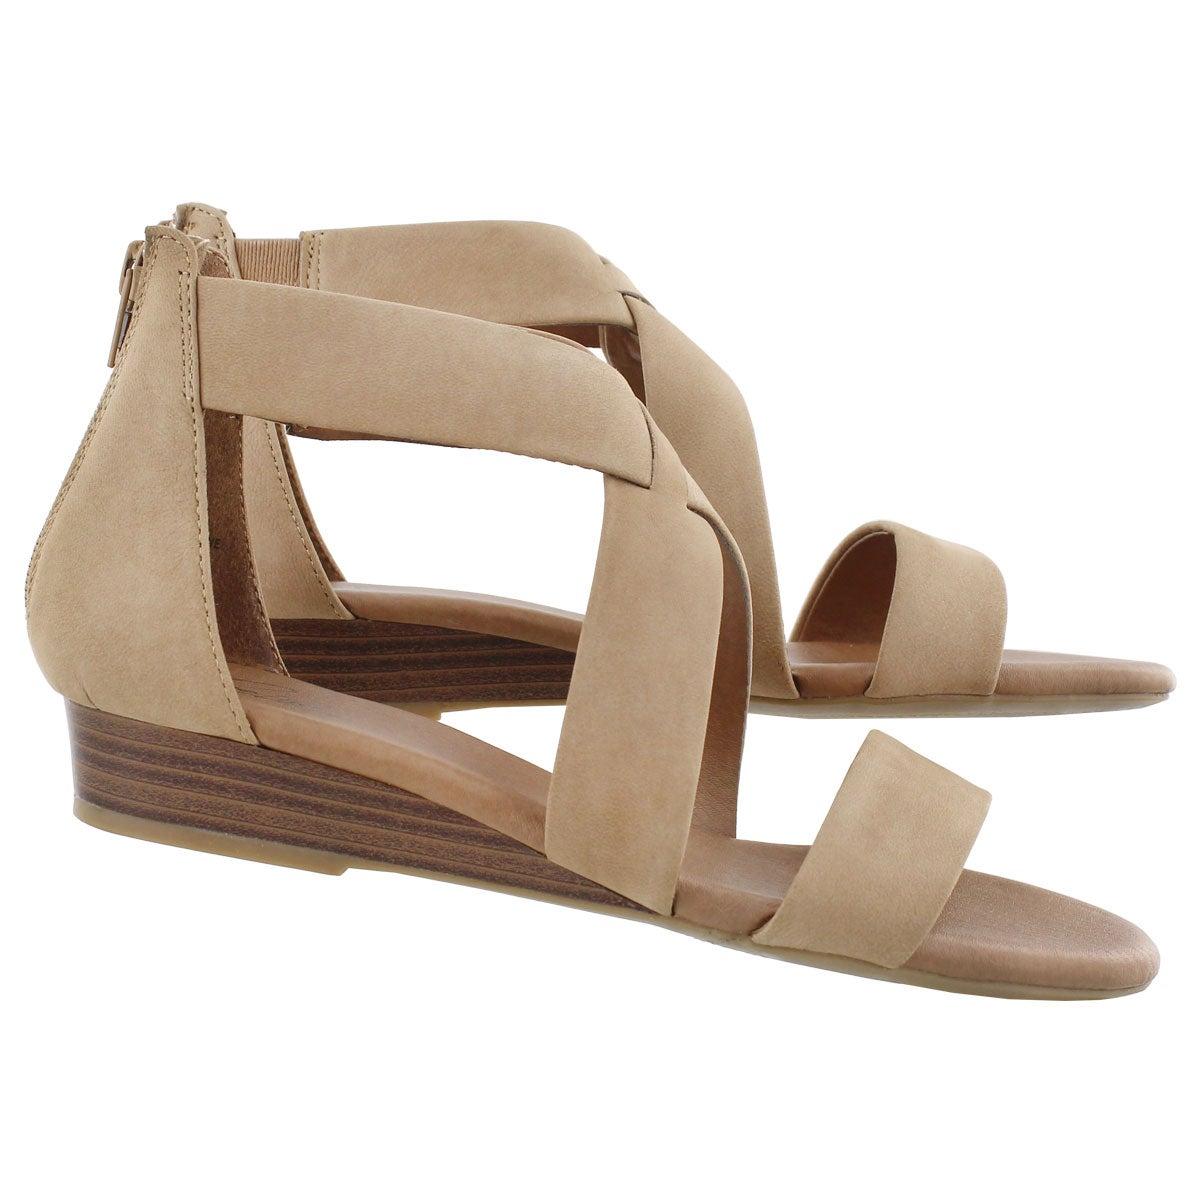 Sandale mousse visc Emilia 2, sable, fem